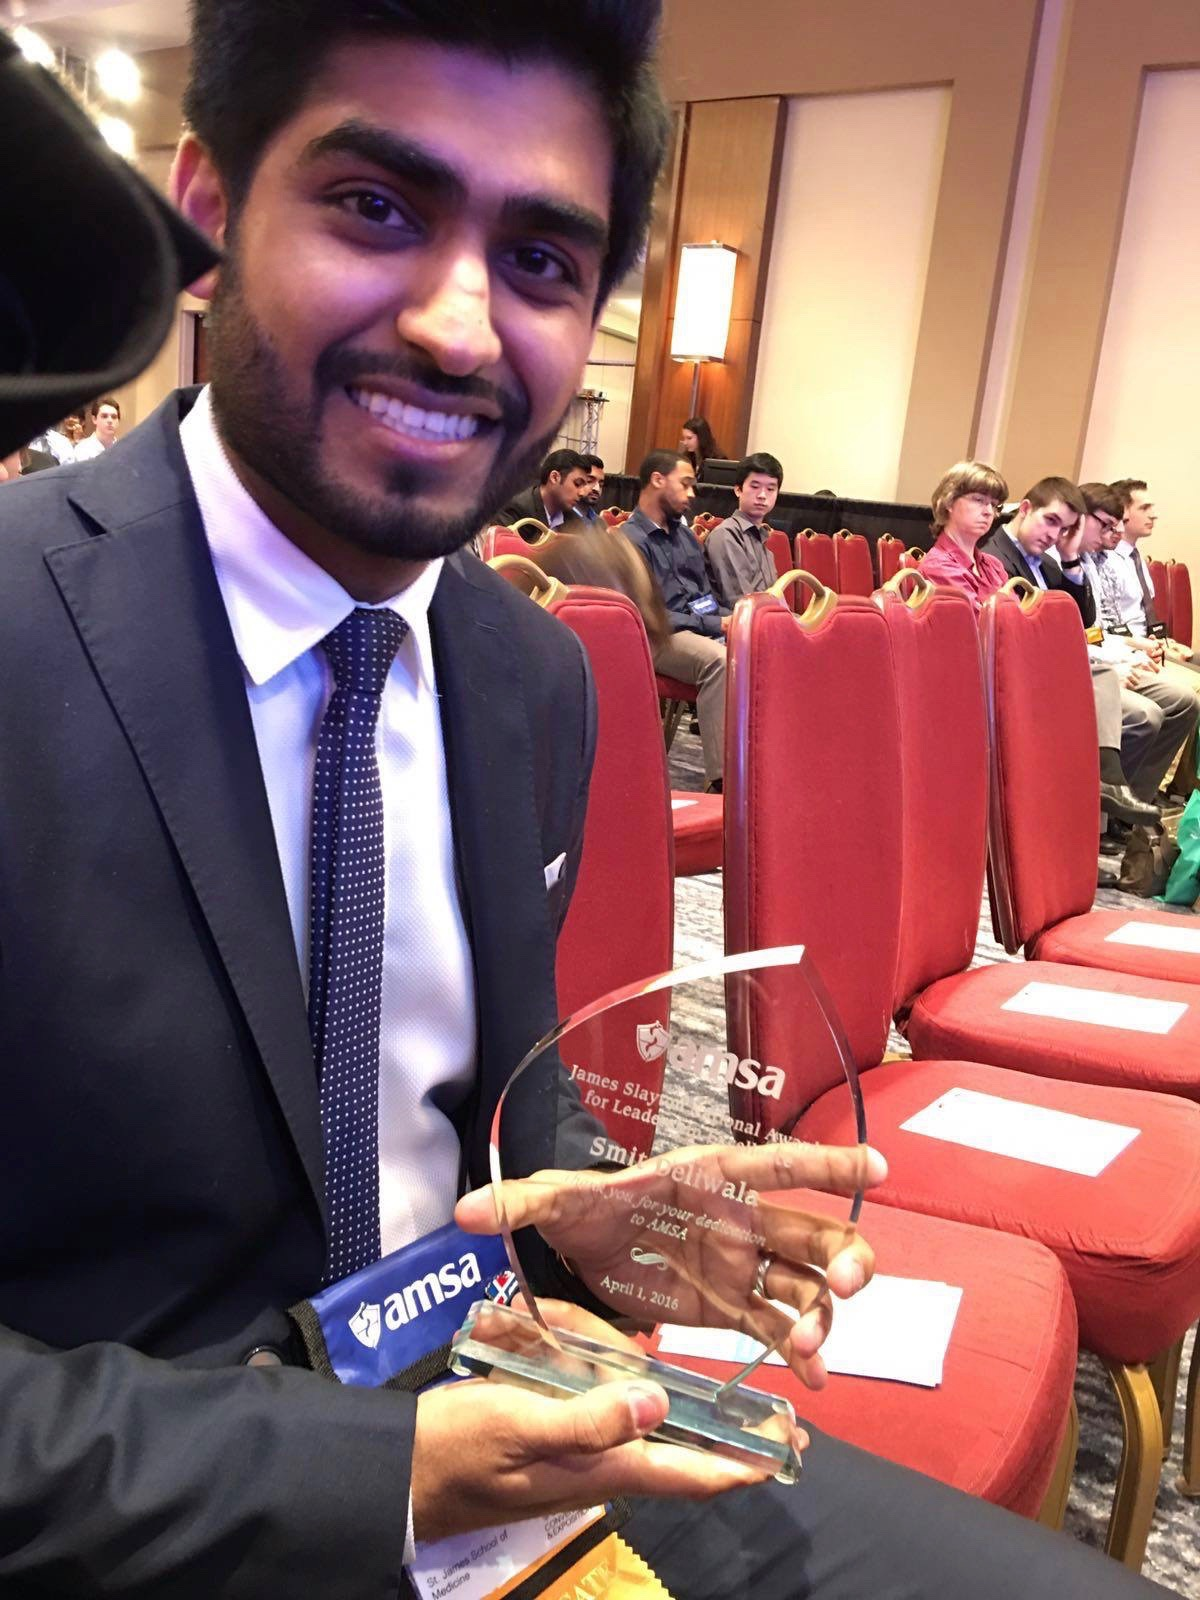 SJSM Student Smit with American Medical Student Association Award